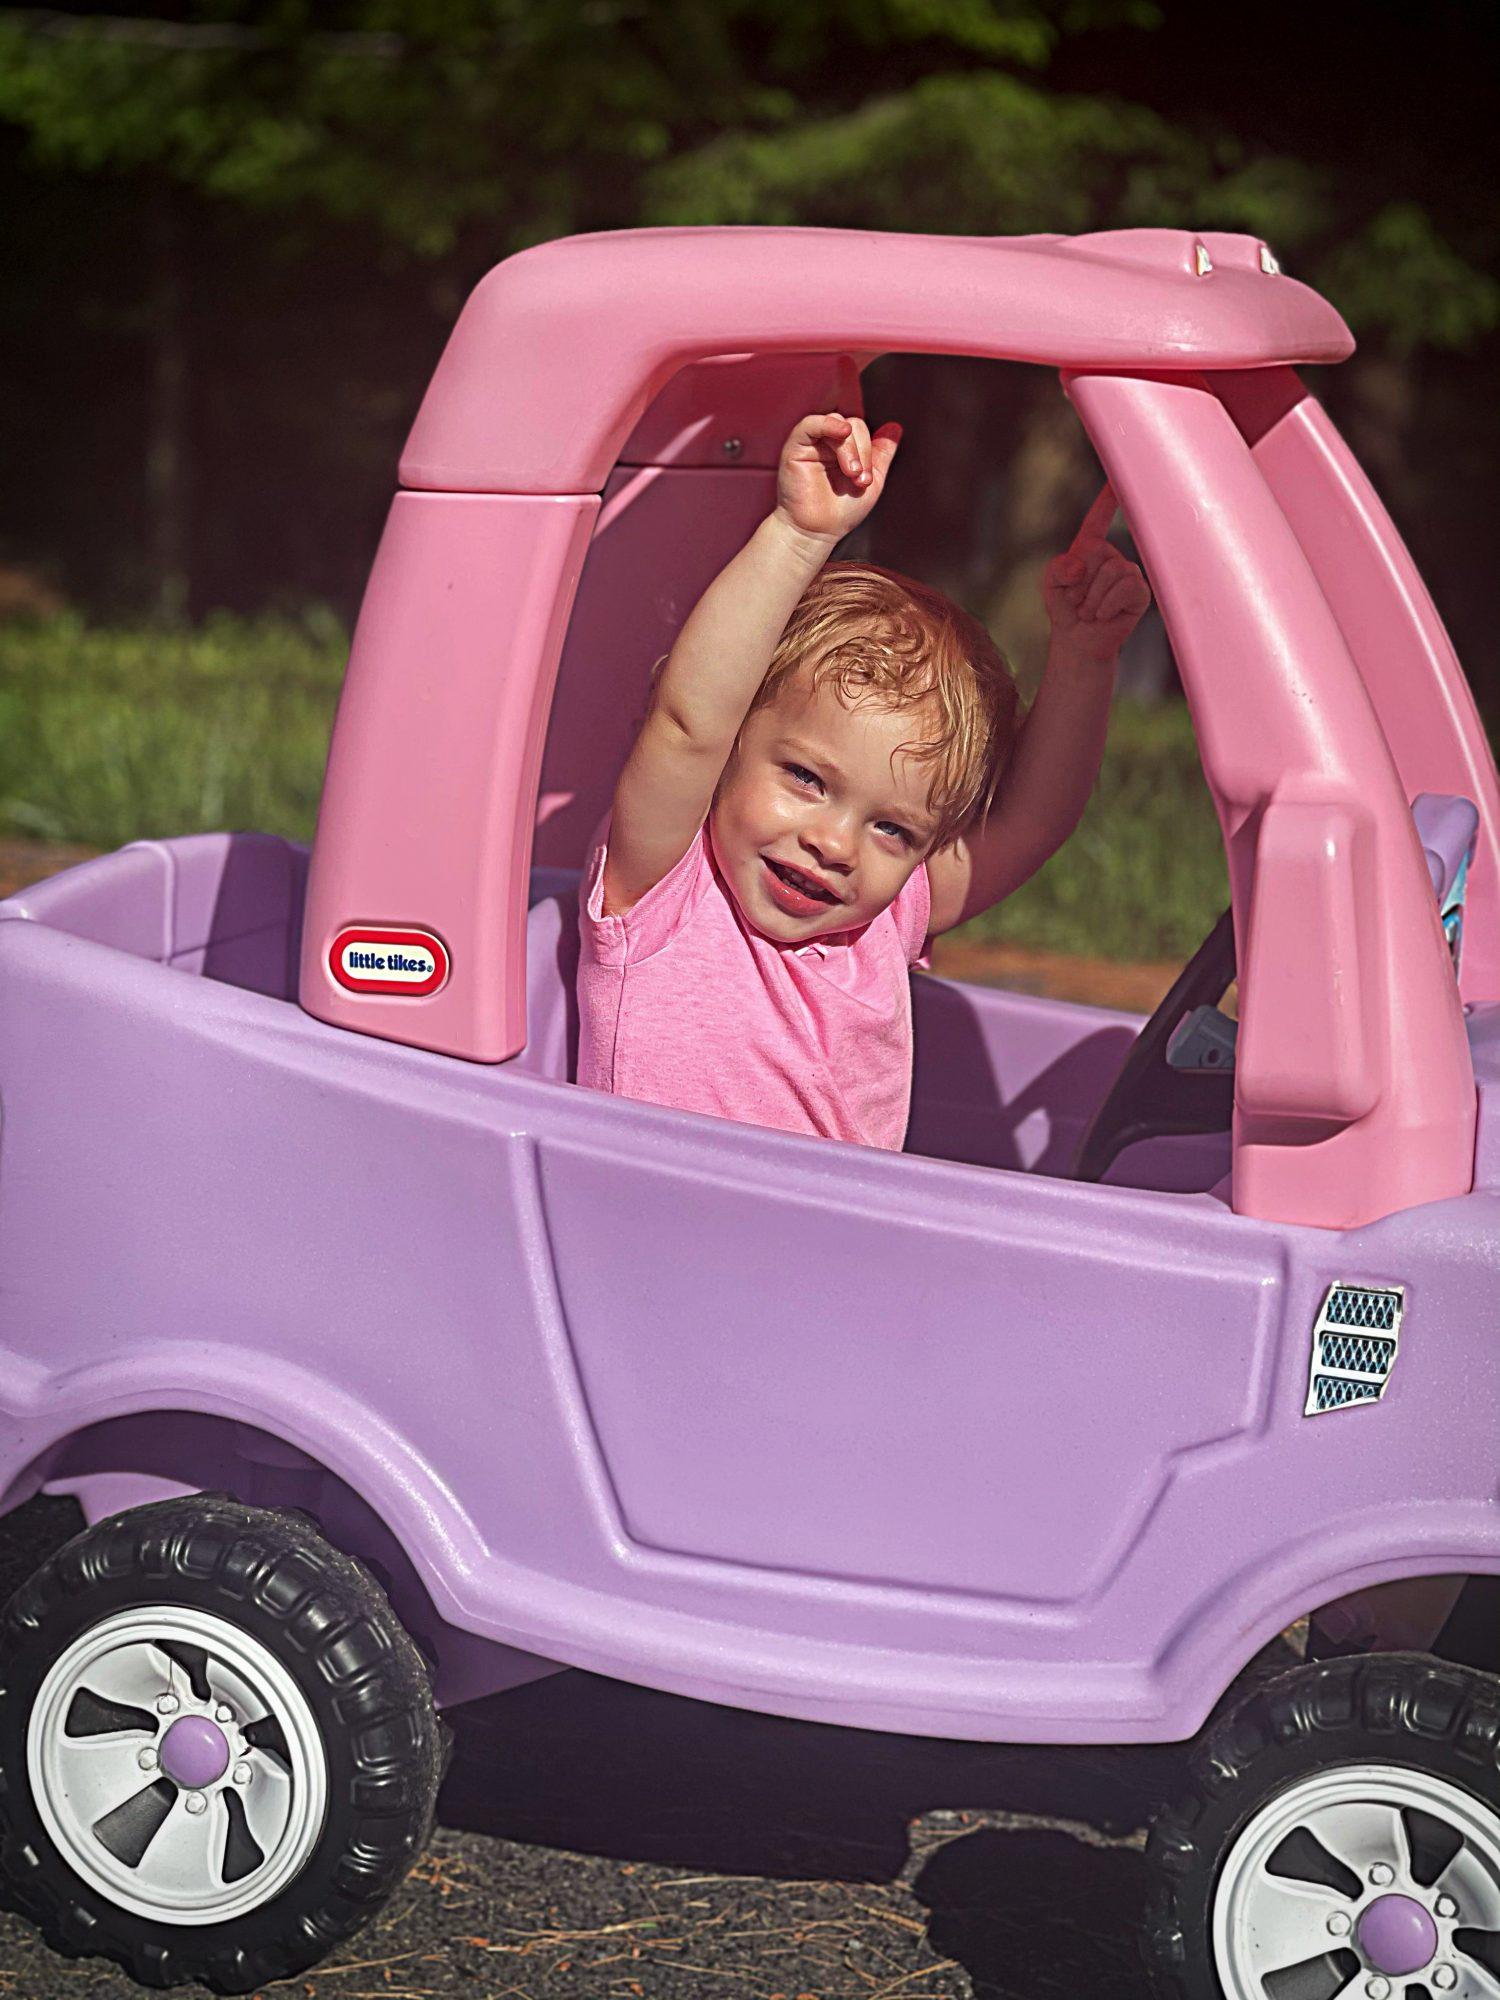 Leah Greenstein in her Little Tikes car